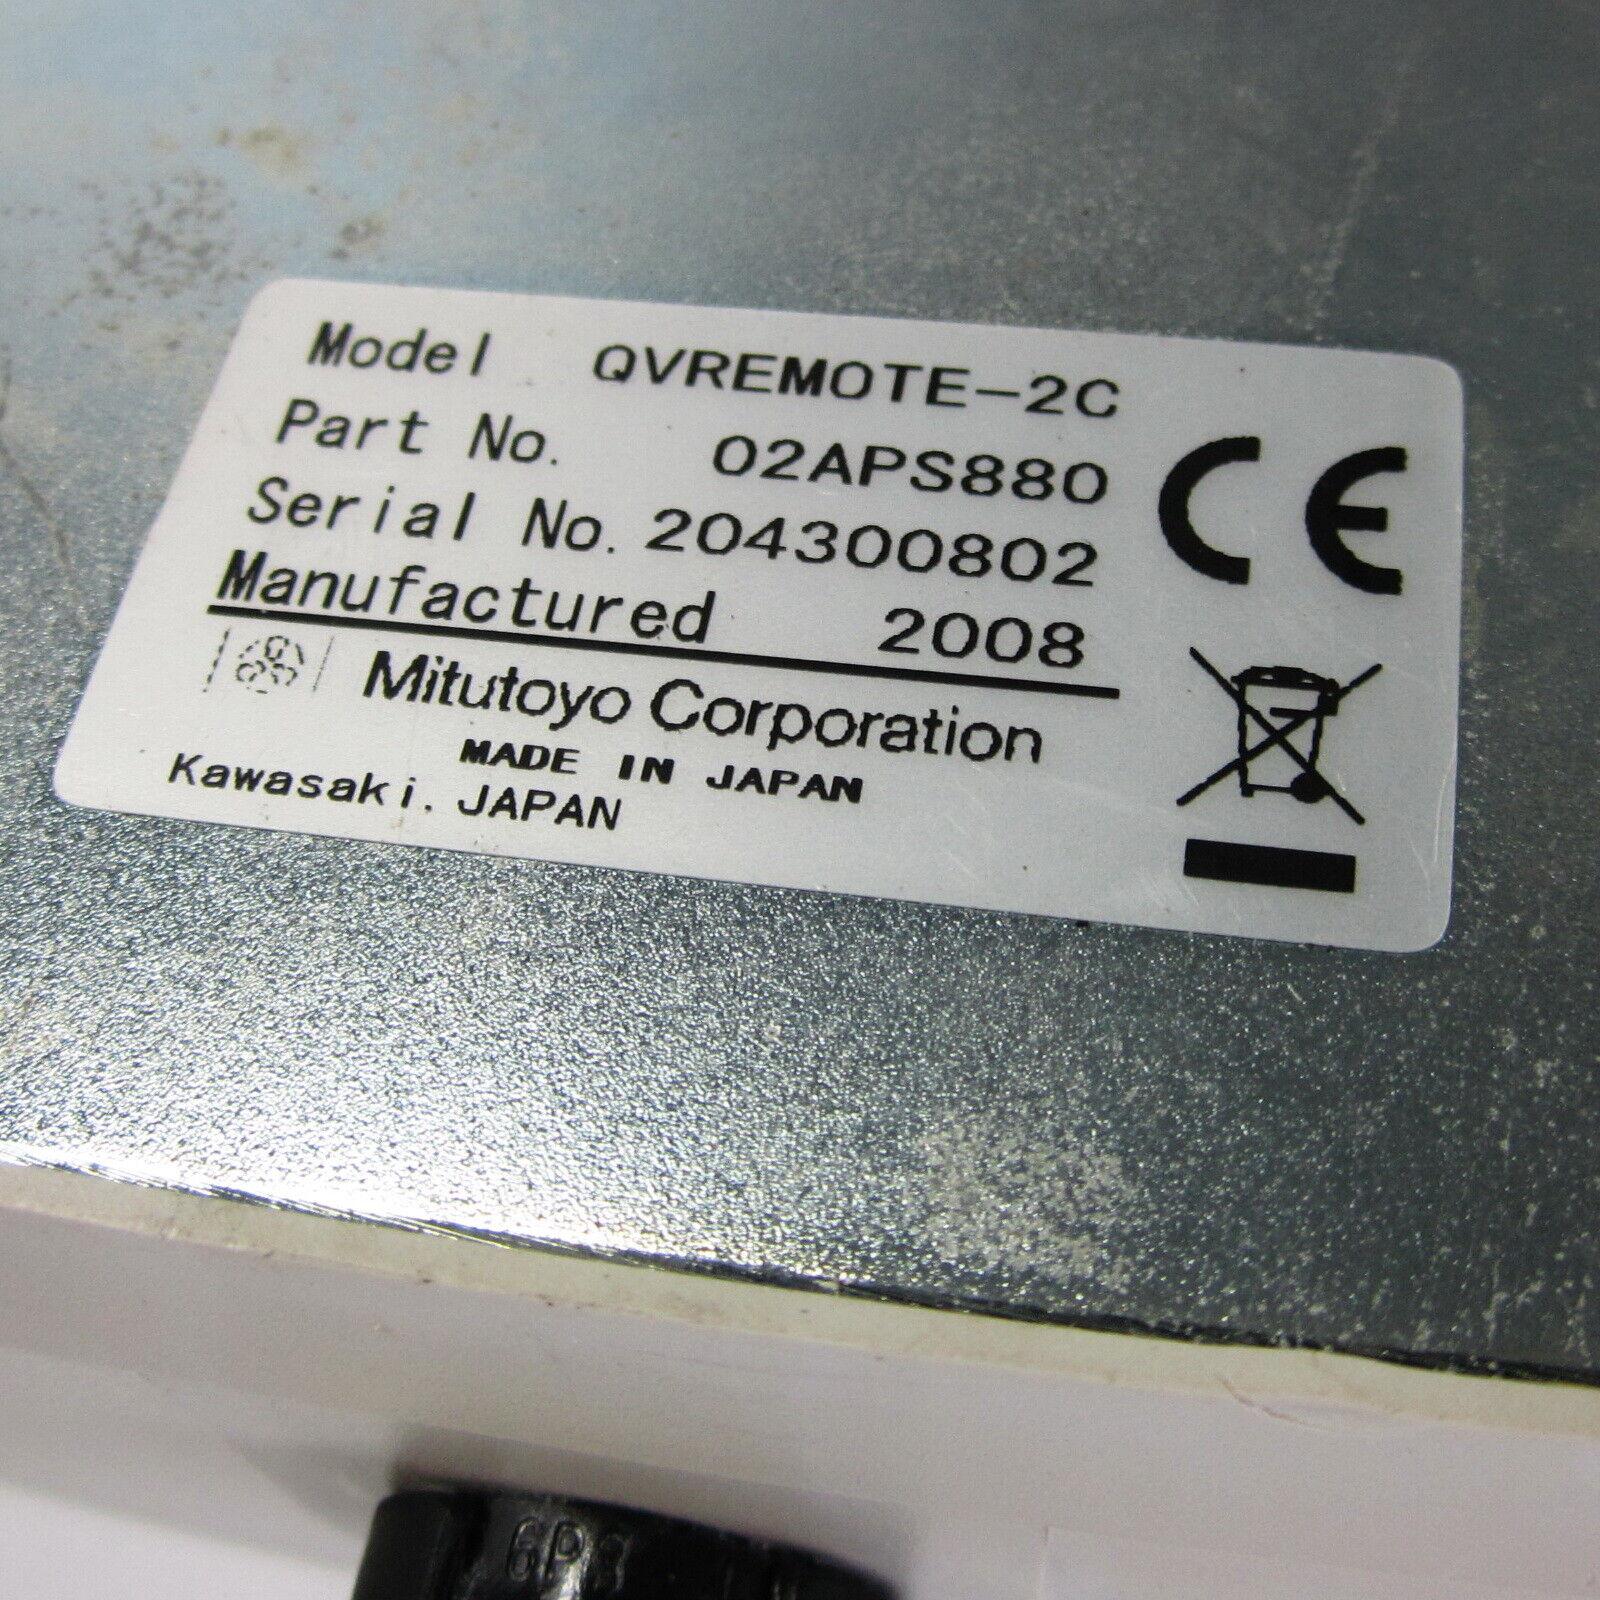 Image 41 - MITUTOYO QV REMOTE BOX P/N: 02APS880